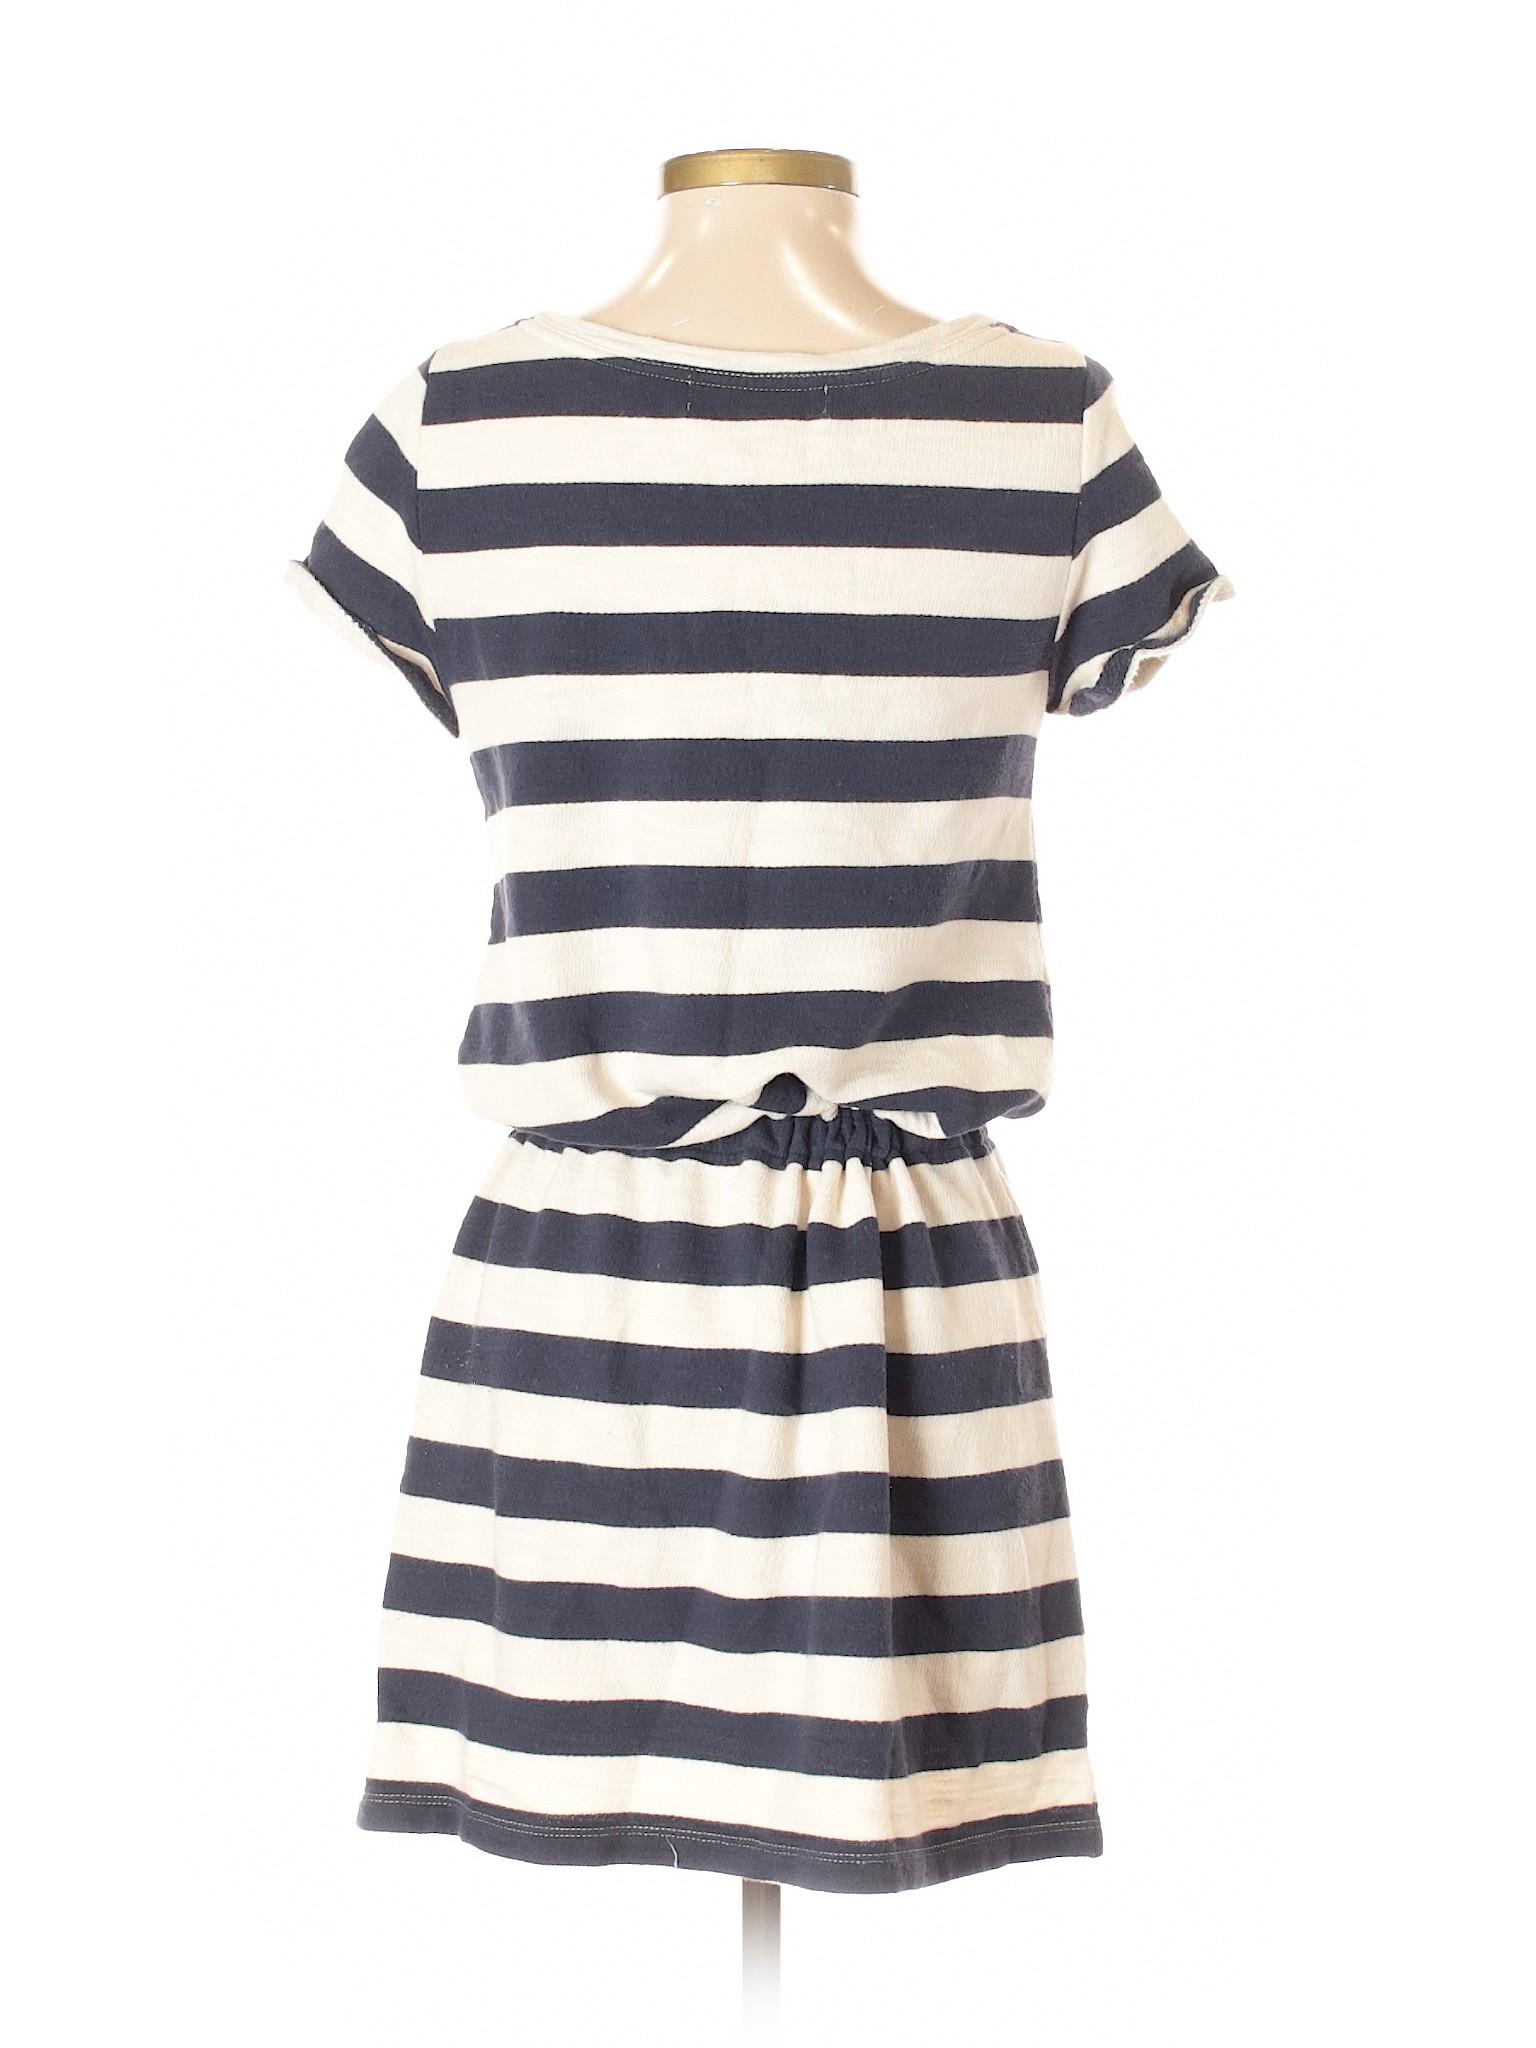 Dress Casual Boutique Taylor winter Ann LOFT qwBxXOgHU